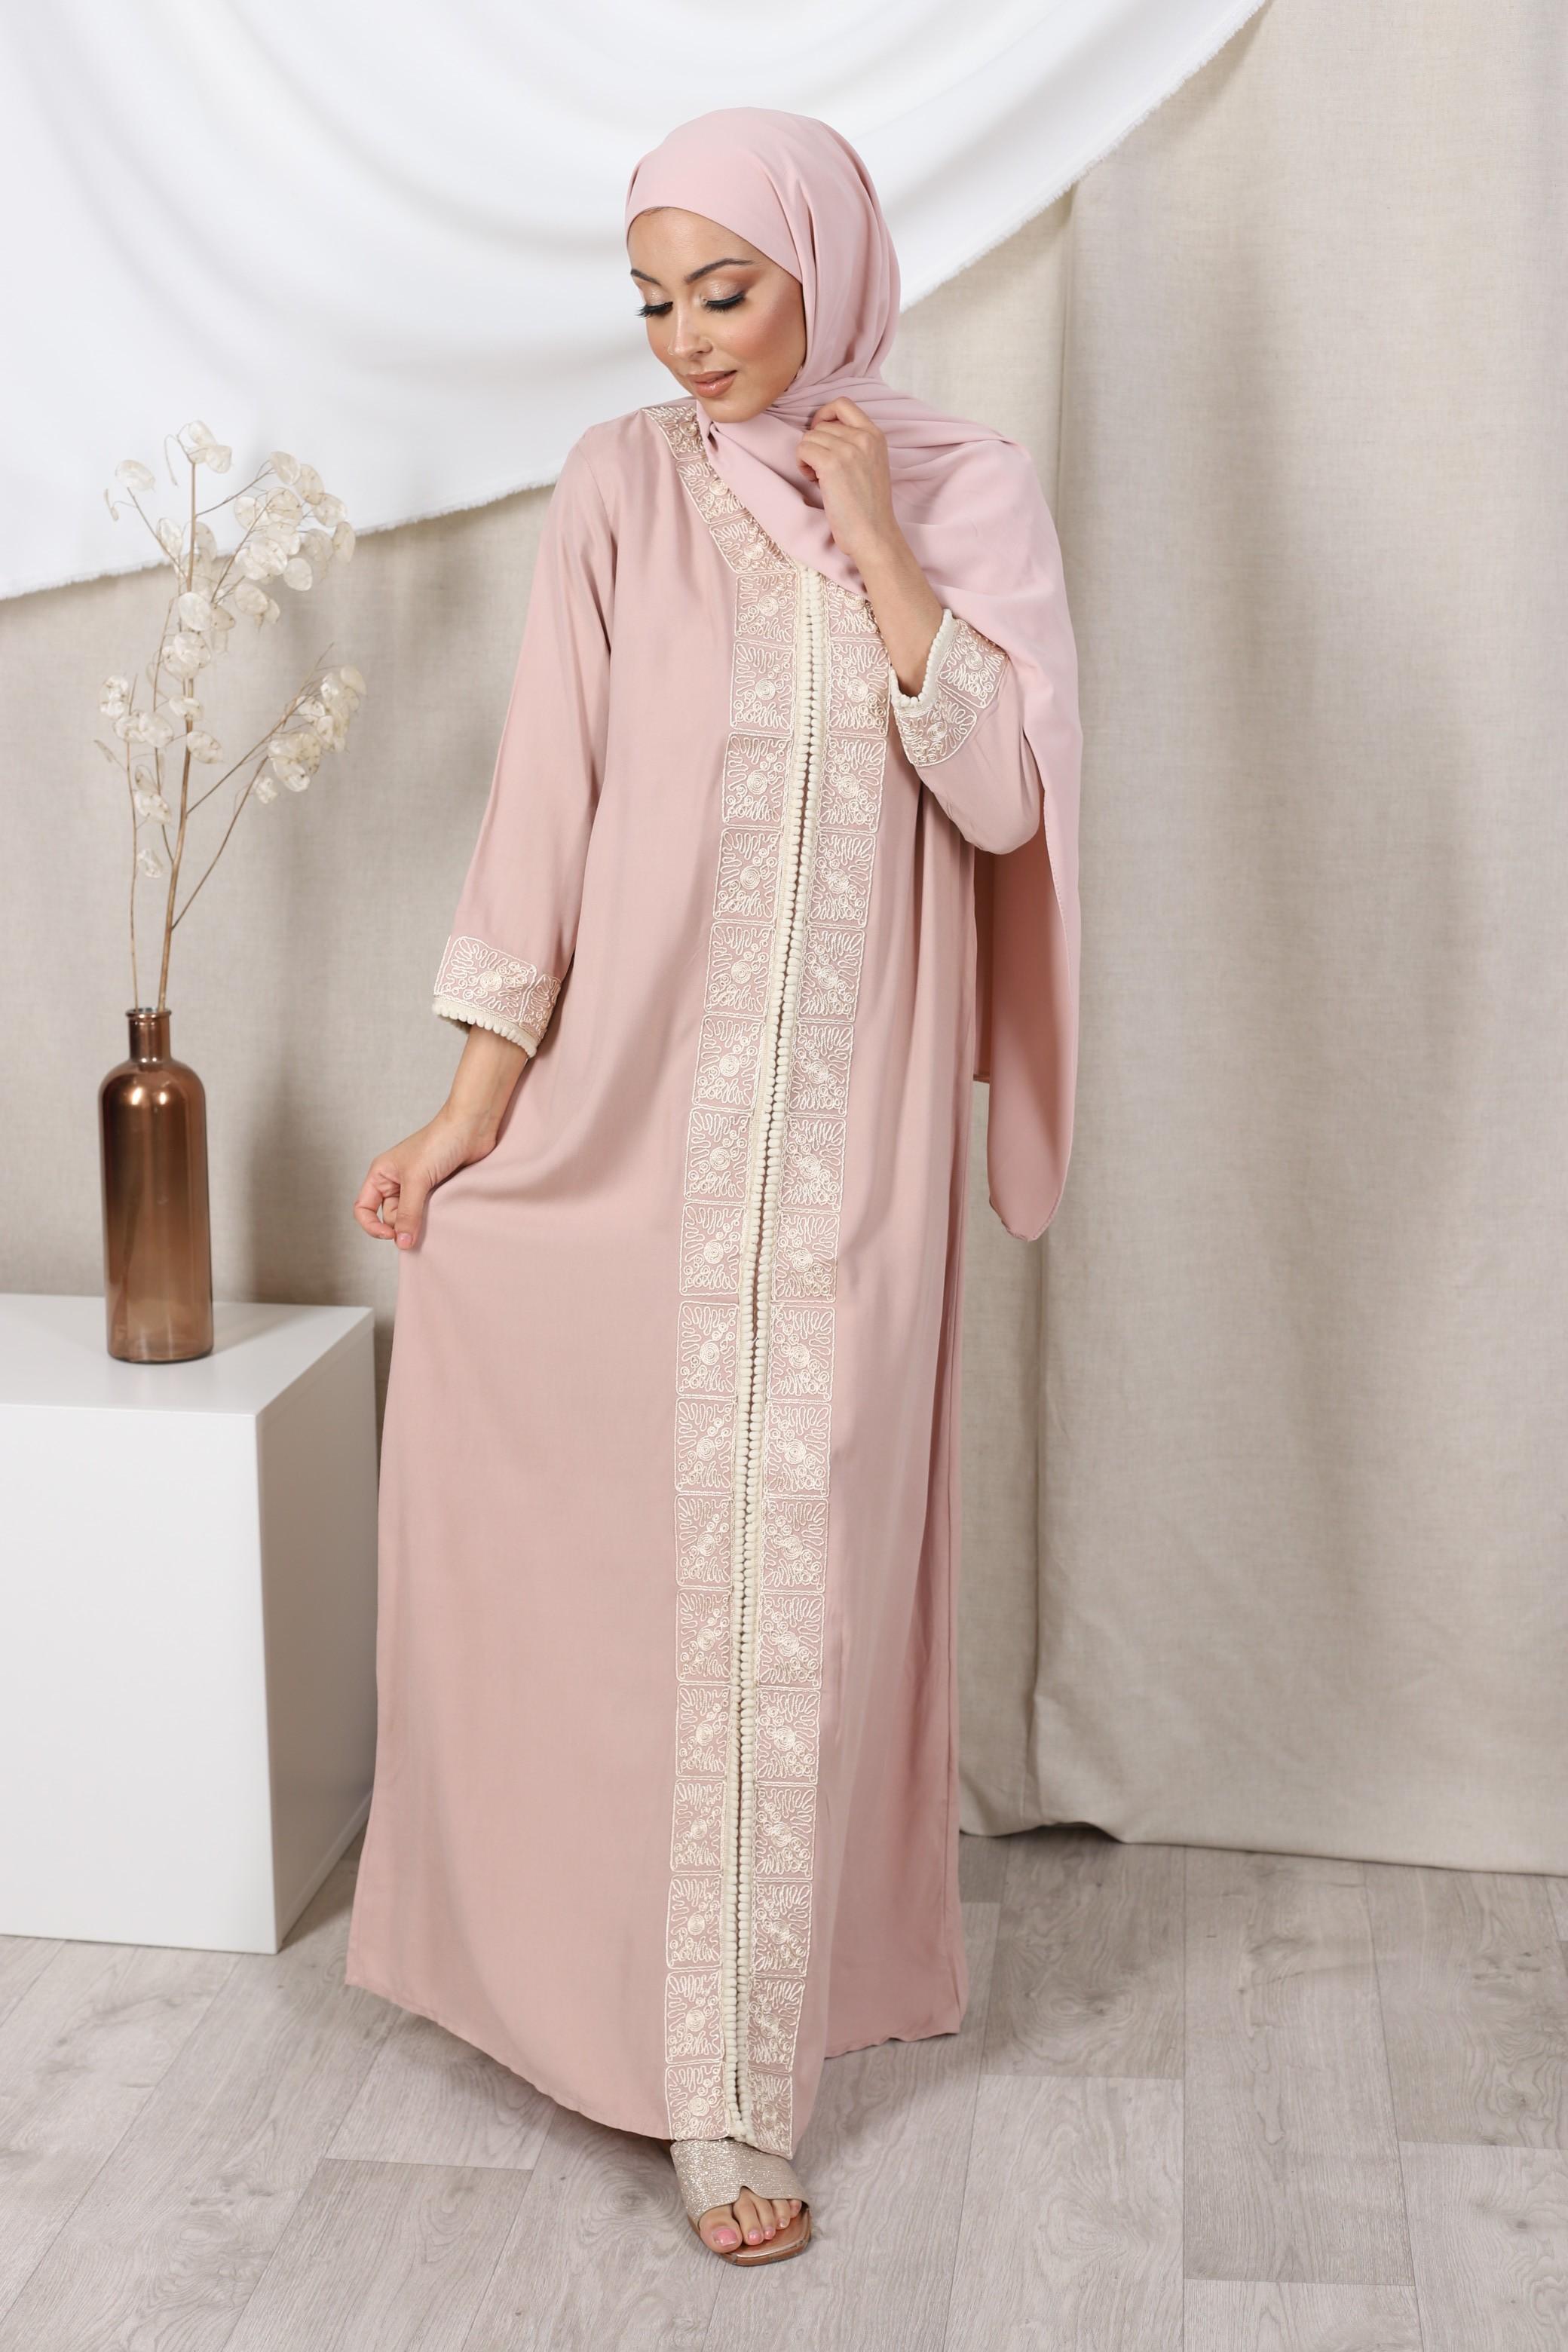 Robe orient rose poudre